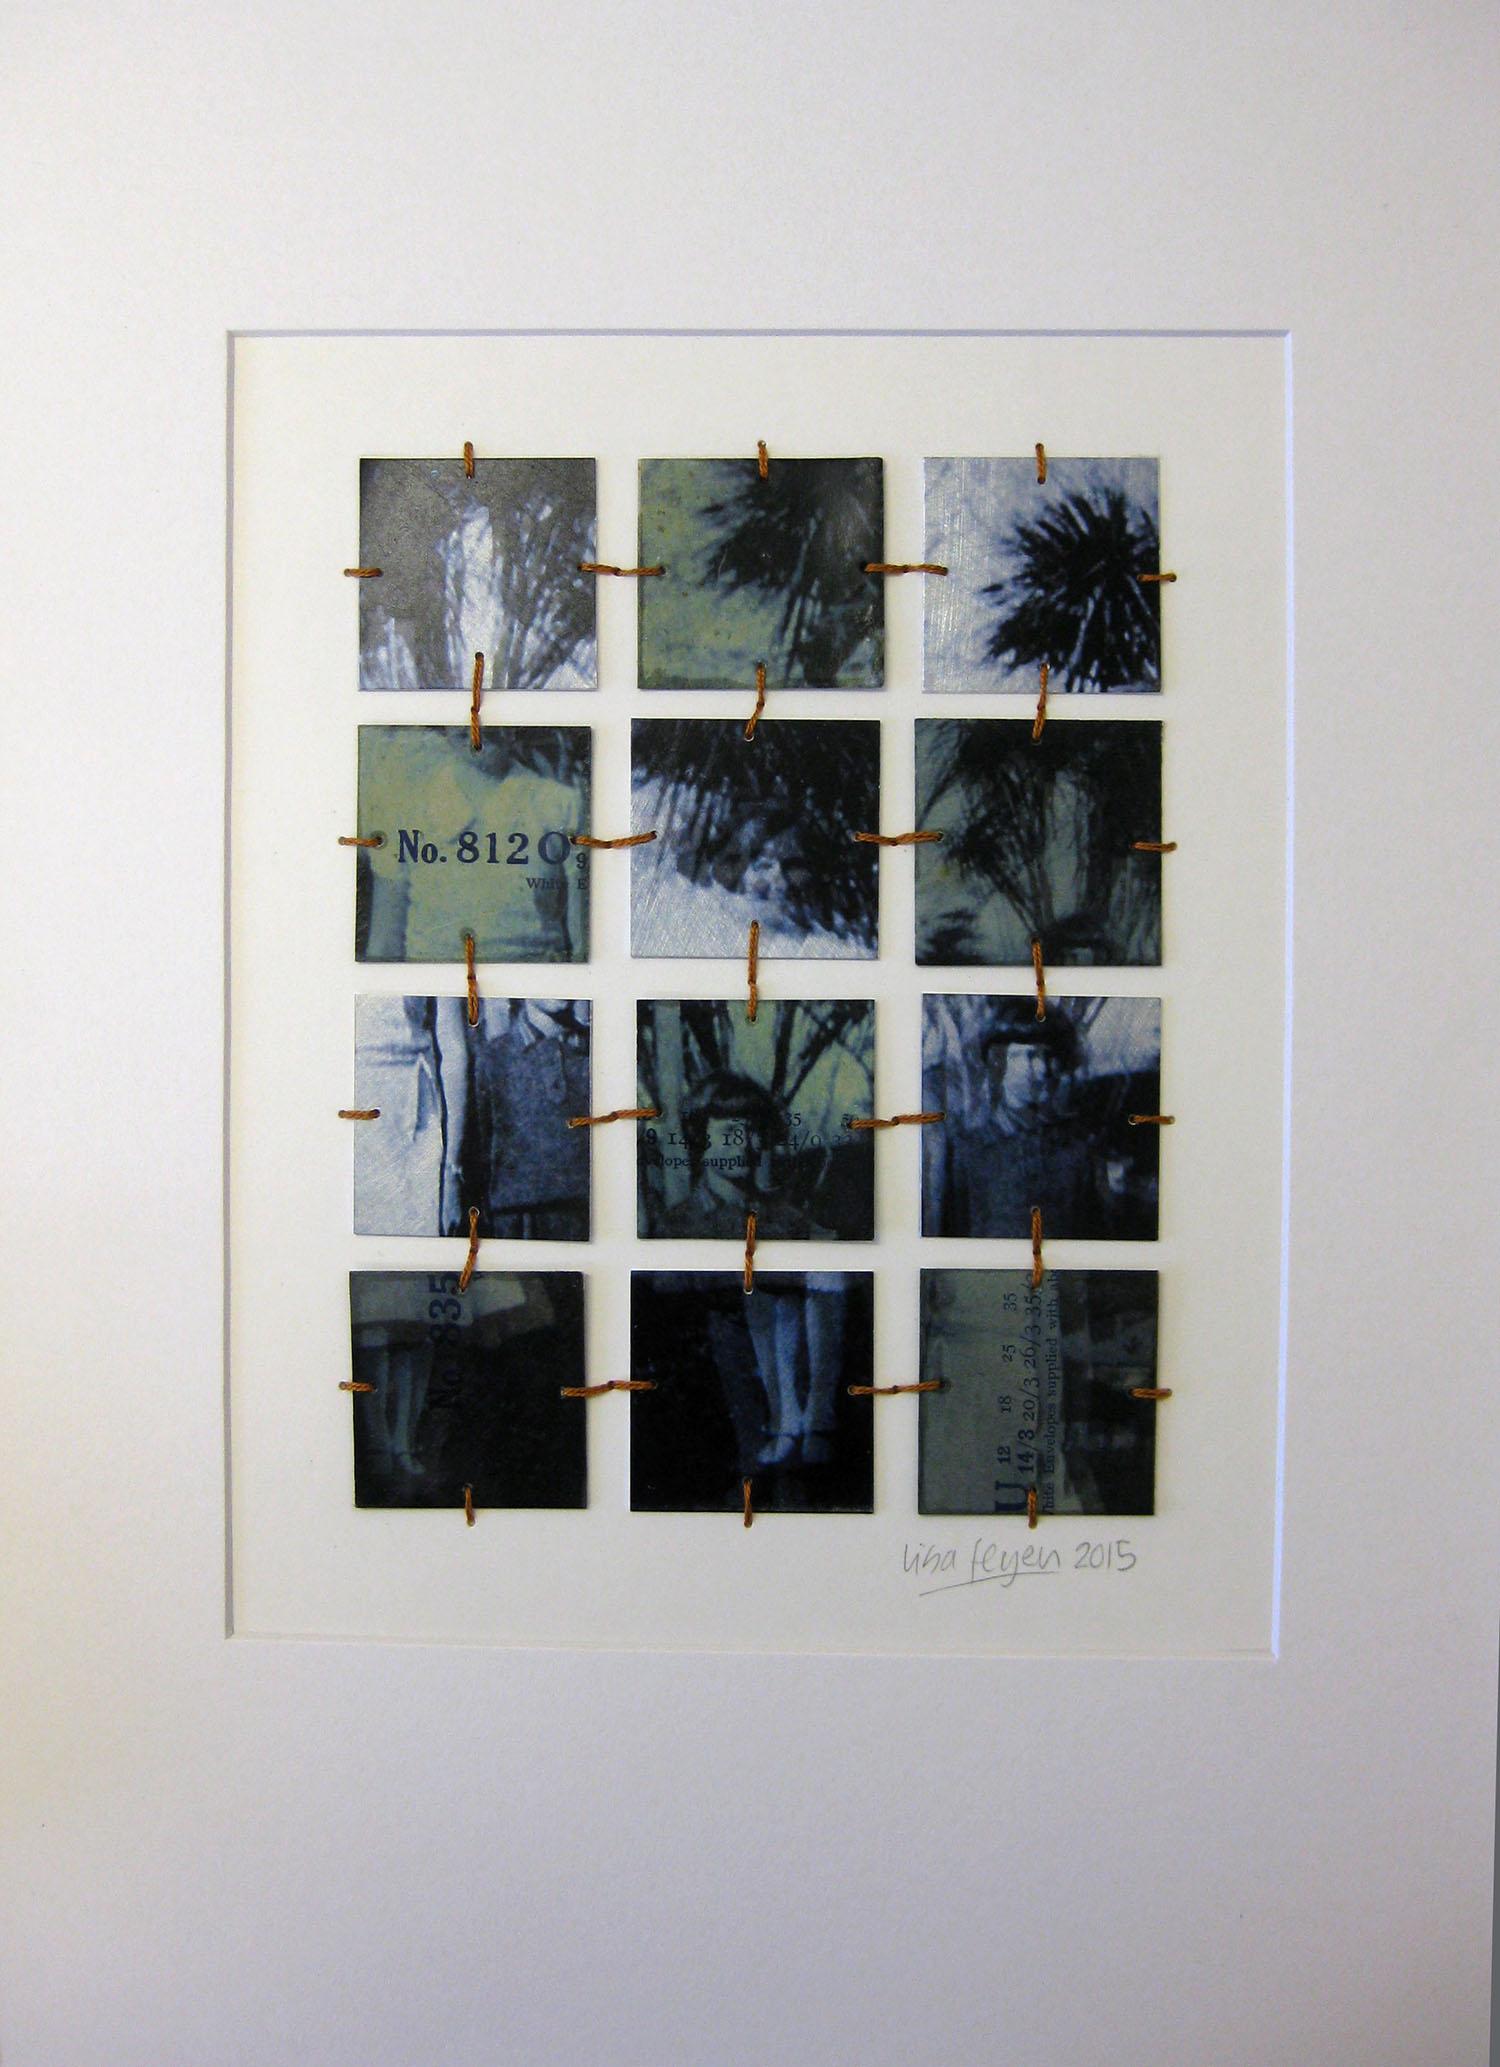 Lest-Remembered-by-Lisa-Feyen